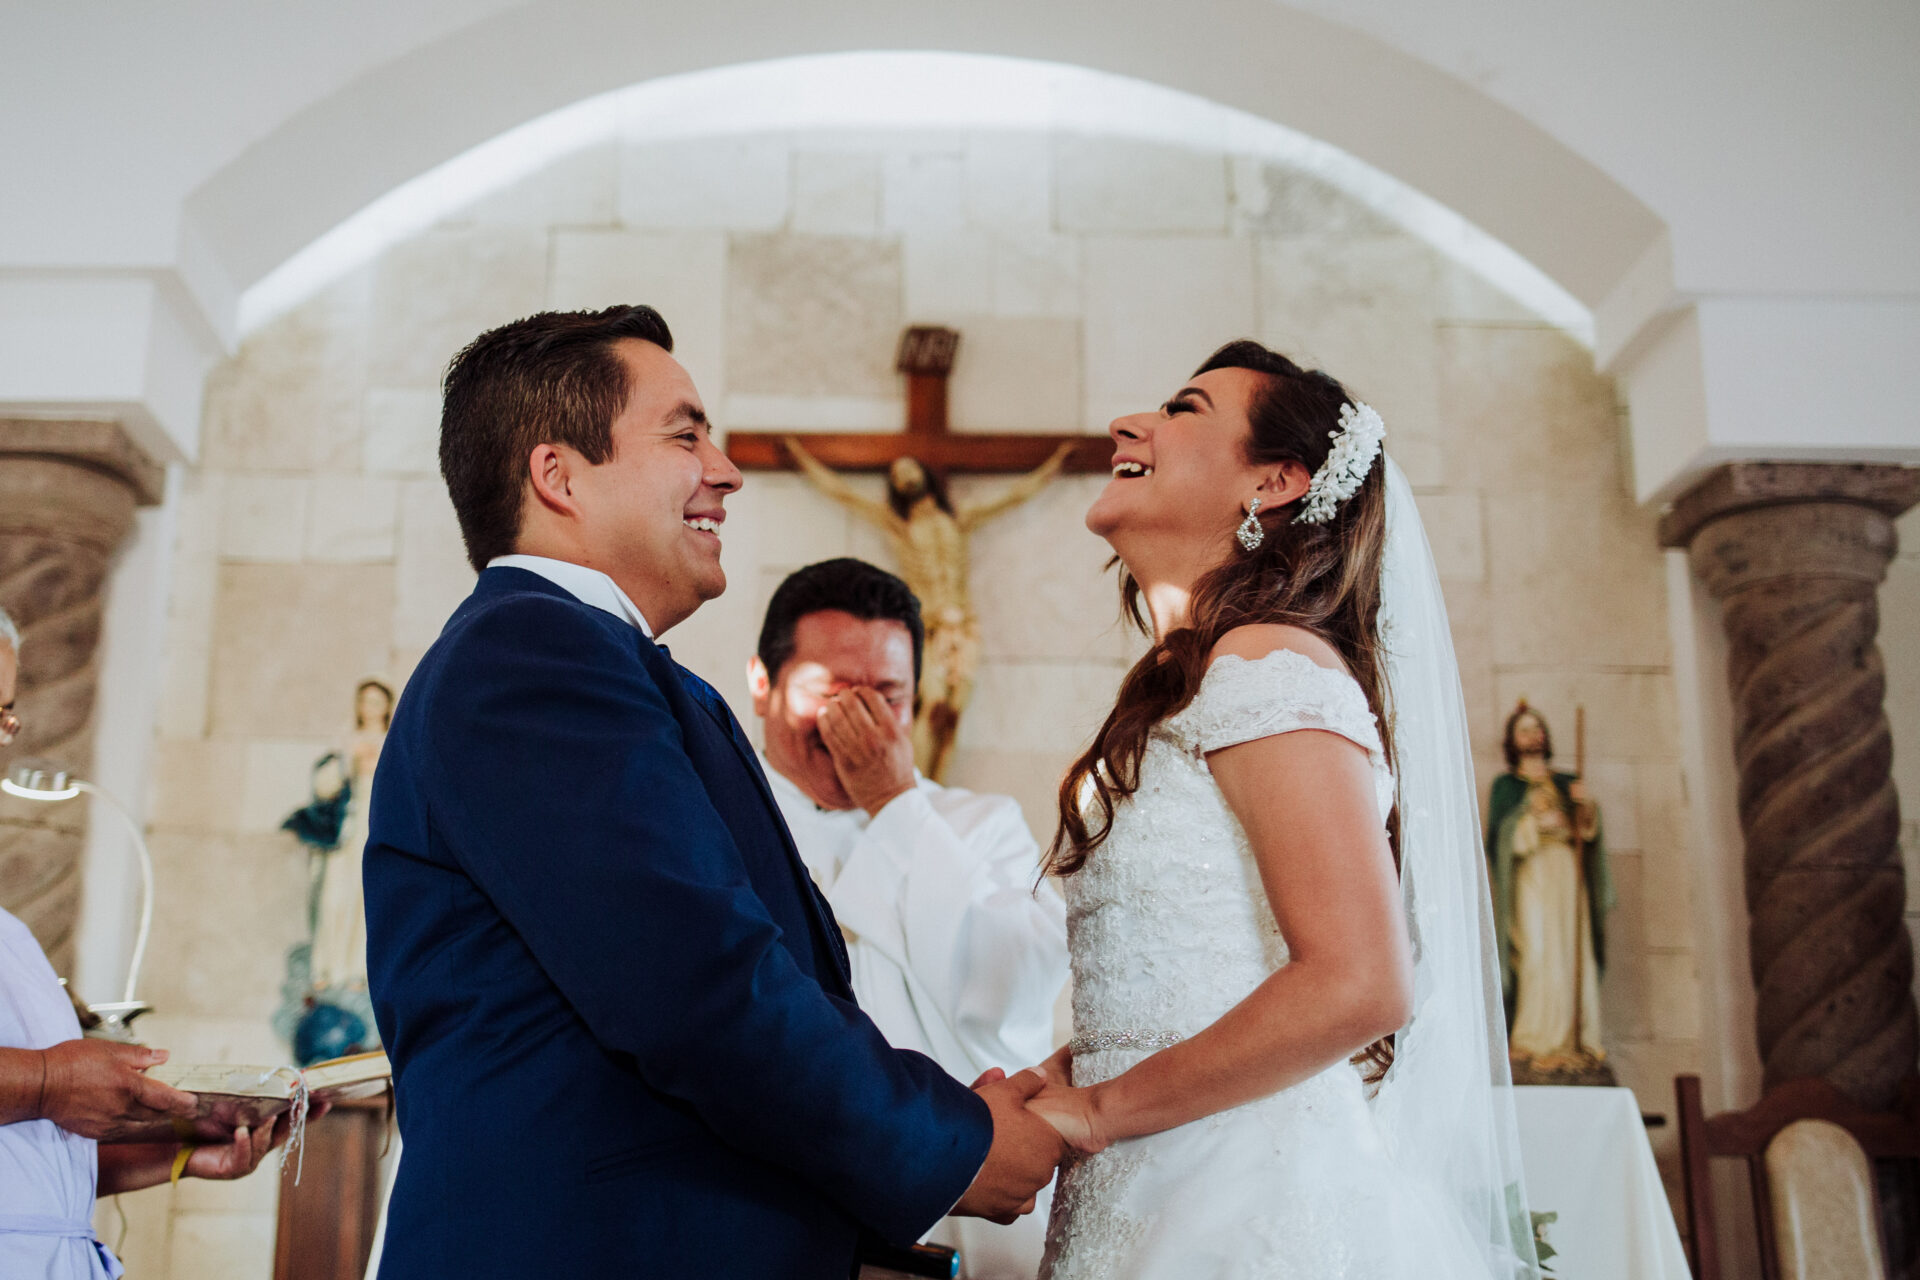 javier_noriega_fotografo_bodas_torreon_coahuila_zacatecas_wedding_photographer30a